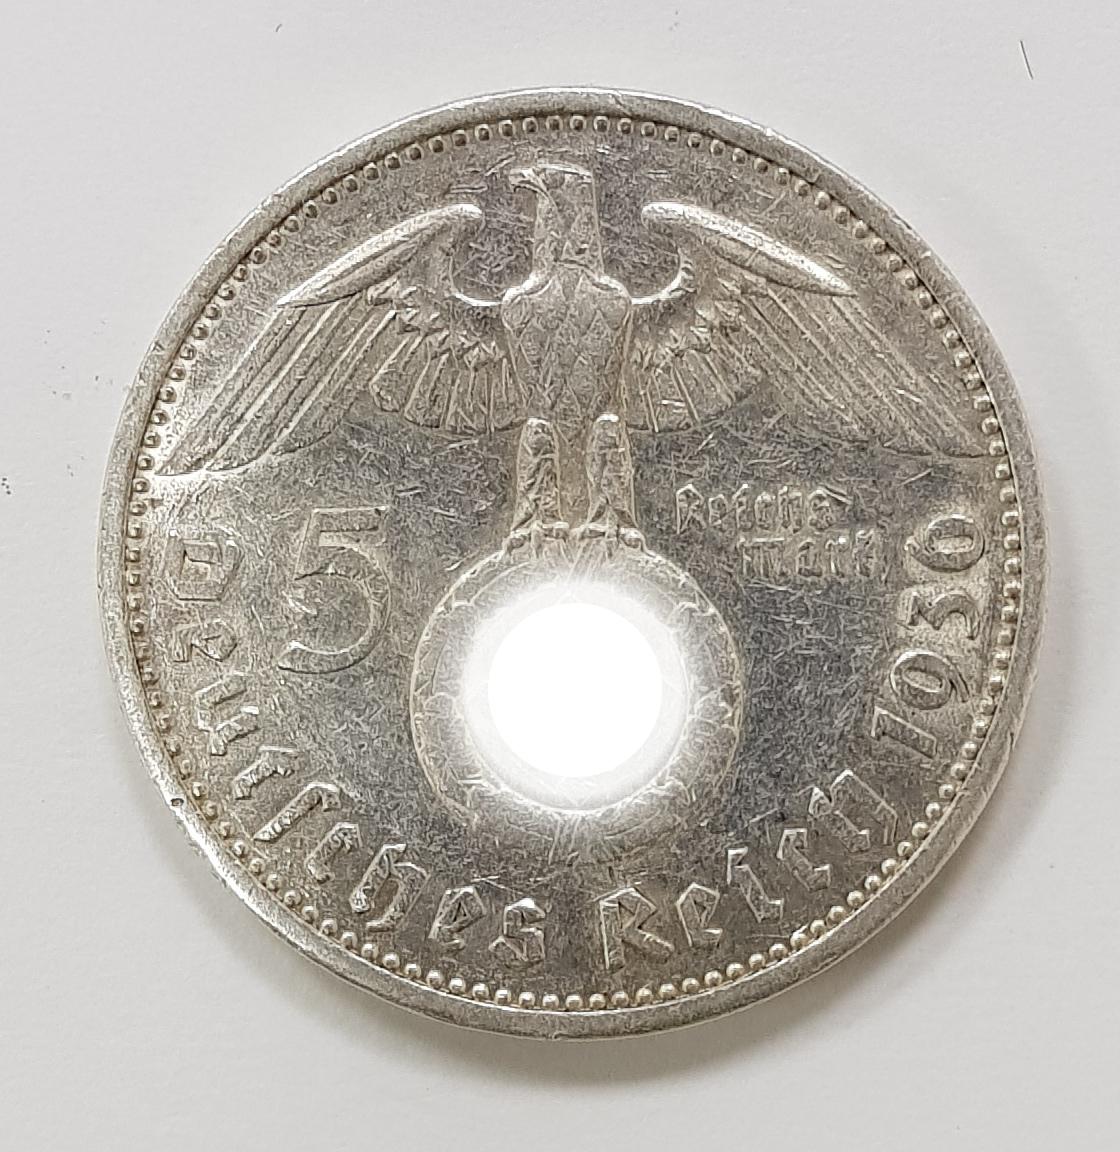 5 марок 3 рейх. 1936 год. (G). XF+